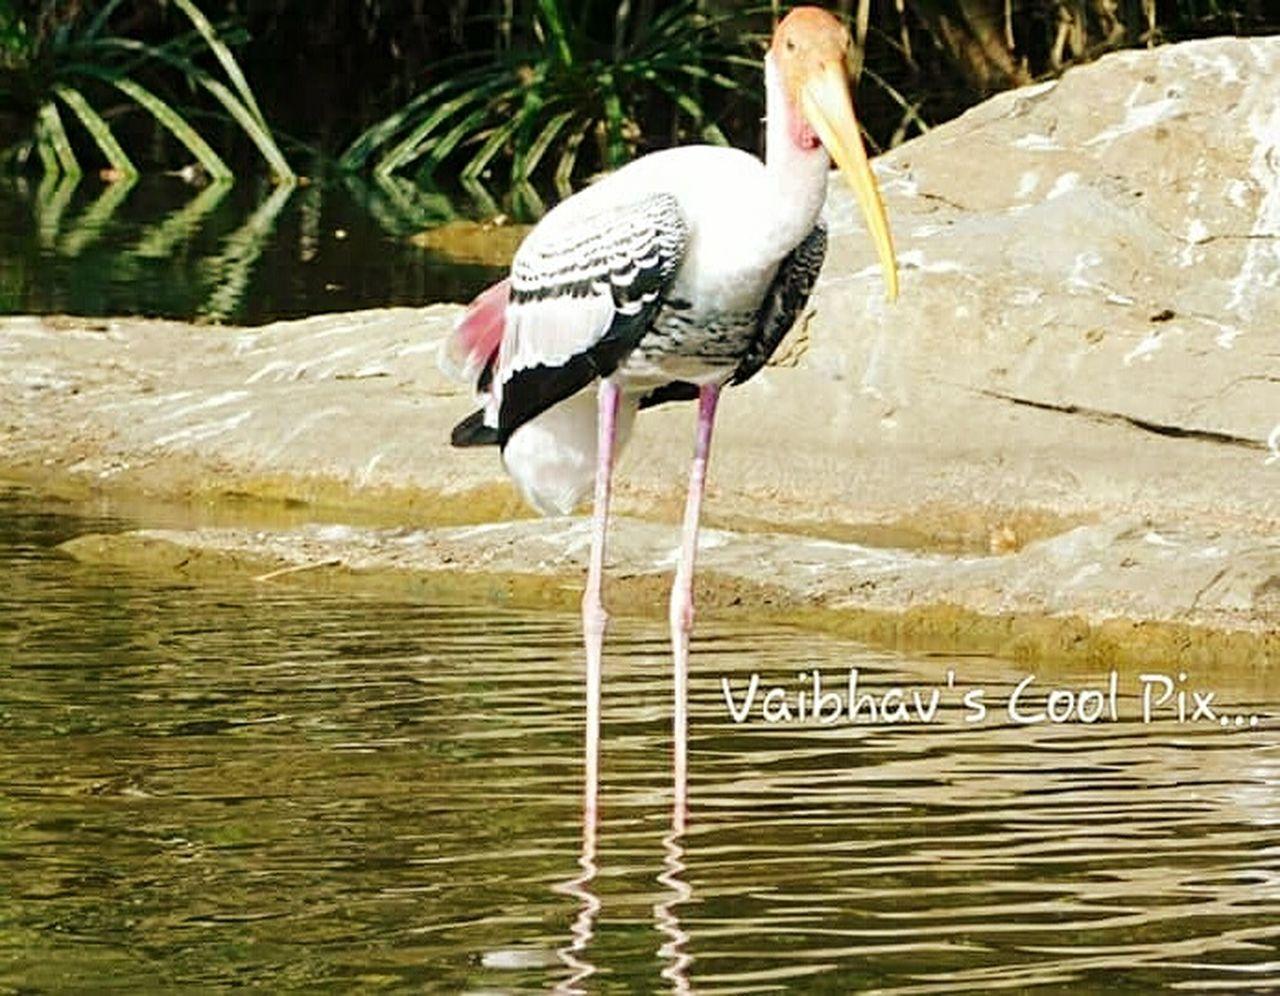 water, bird, stork, animals in the wild, nature, animal wildlife, lake, day, animal themes, outdoors, no people, ibis